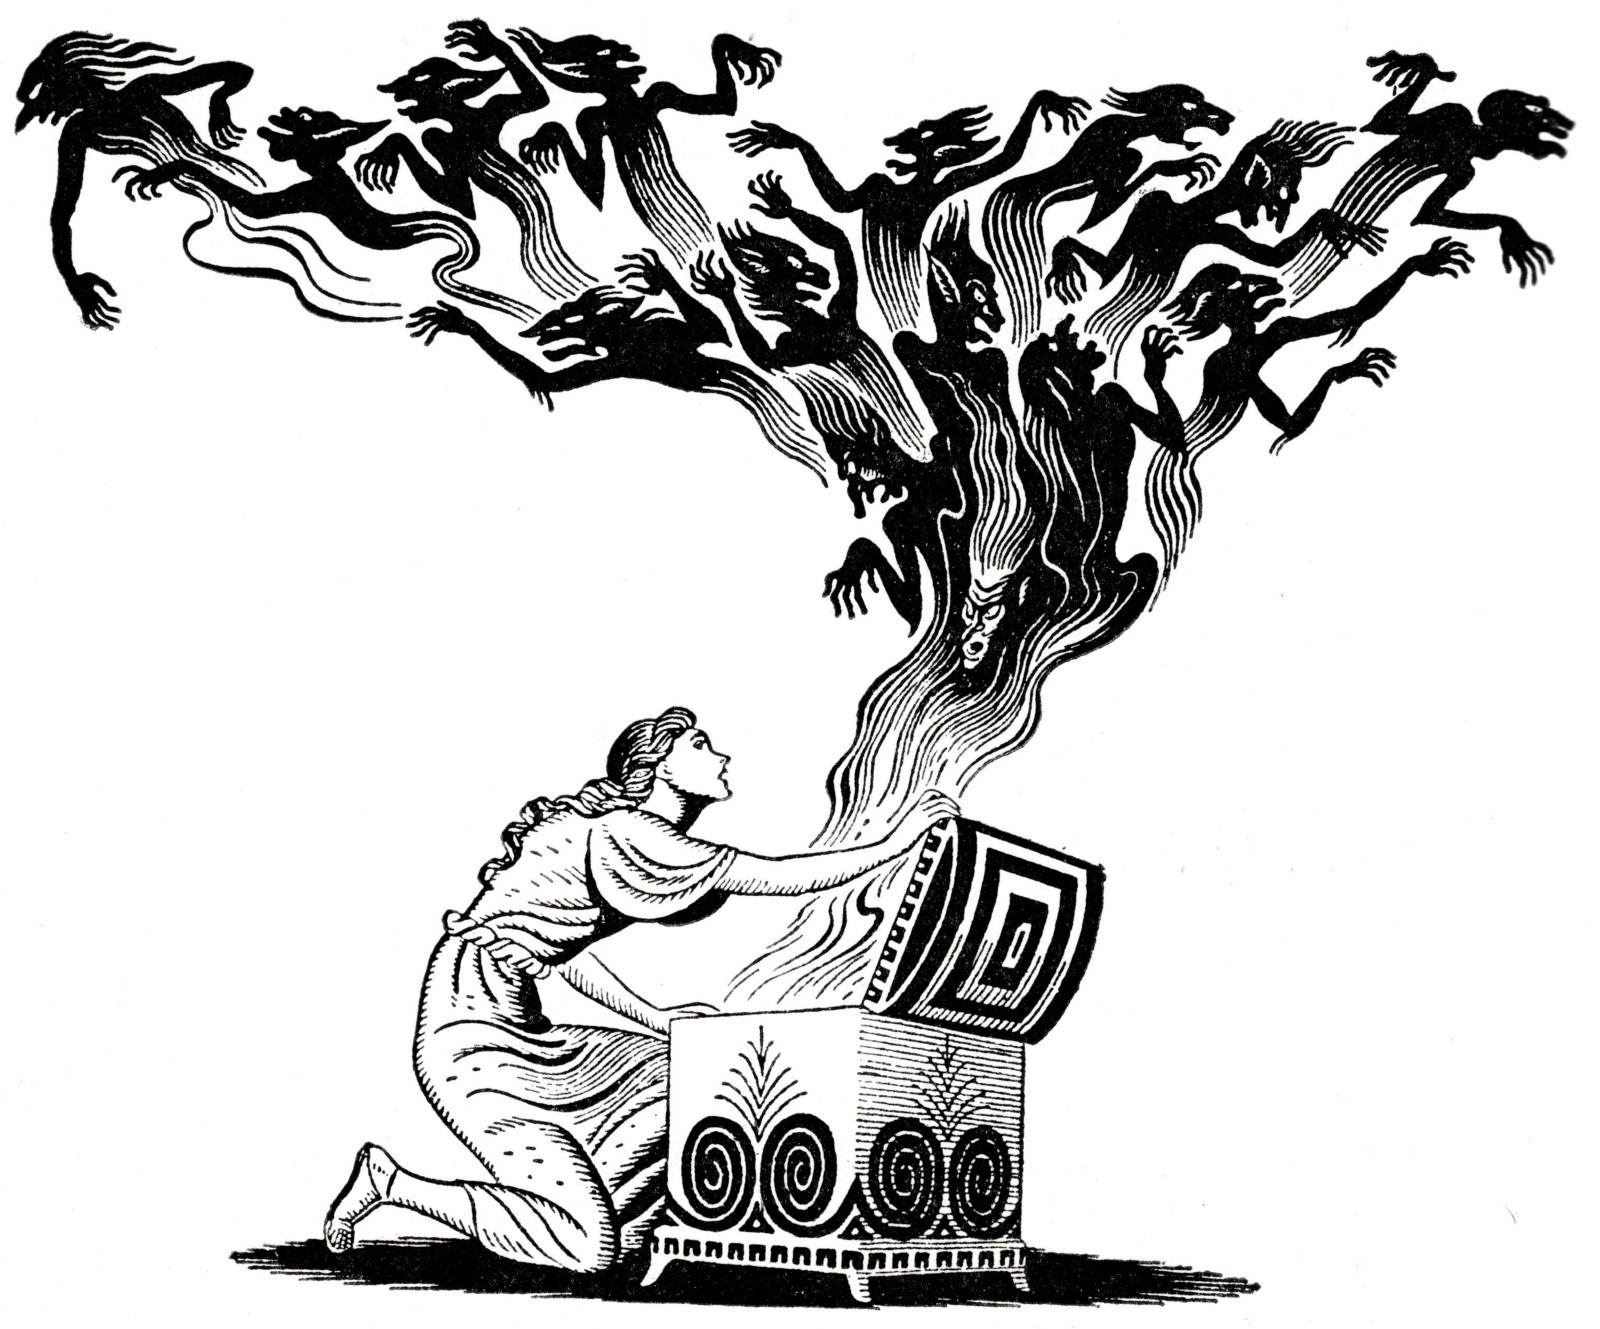 Diary of a Mundane Astrologer: Pandora's Box swings open: the